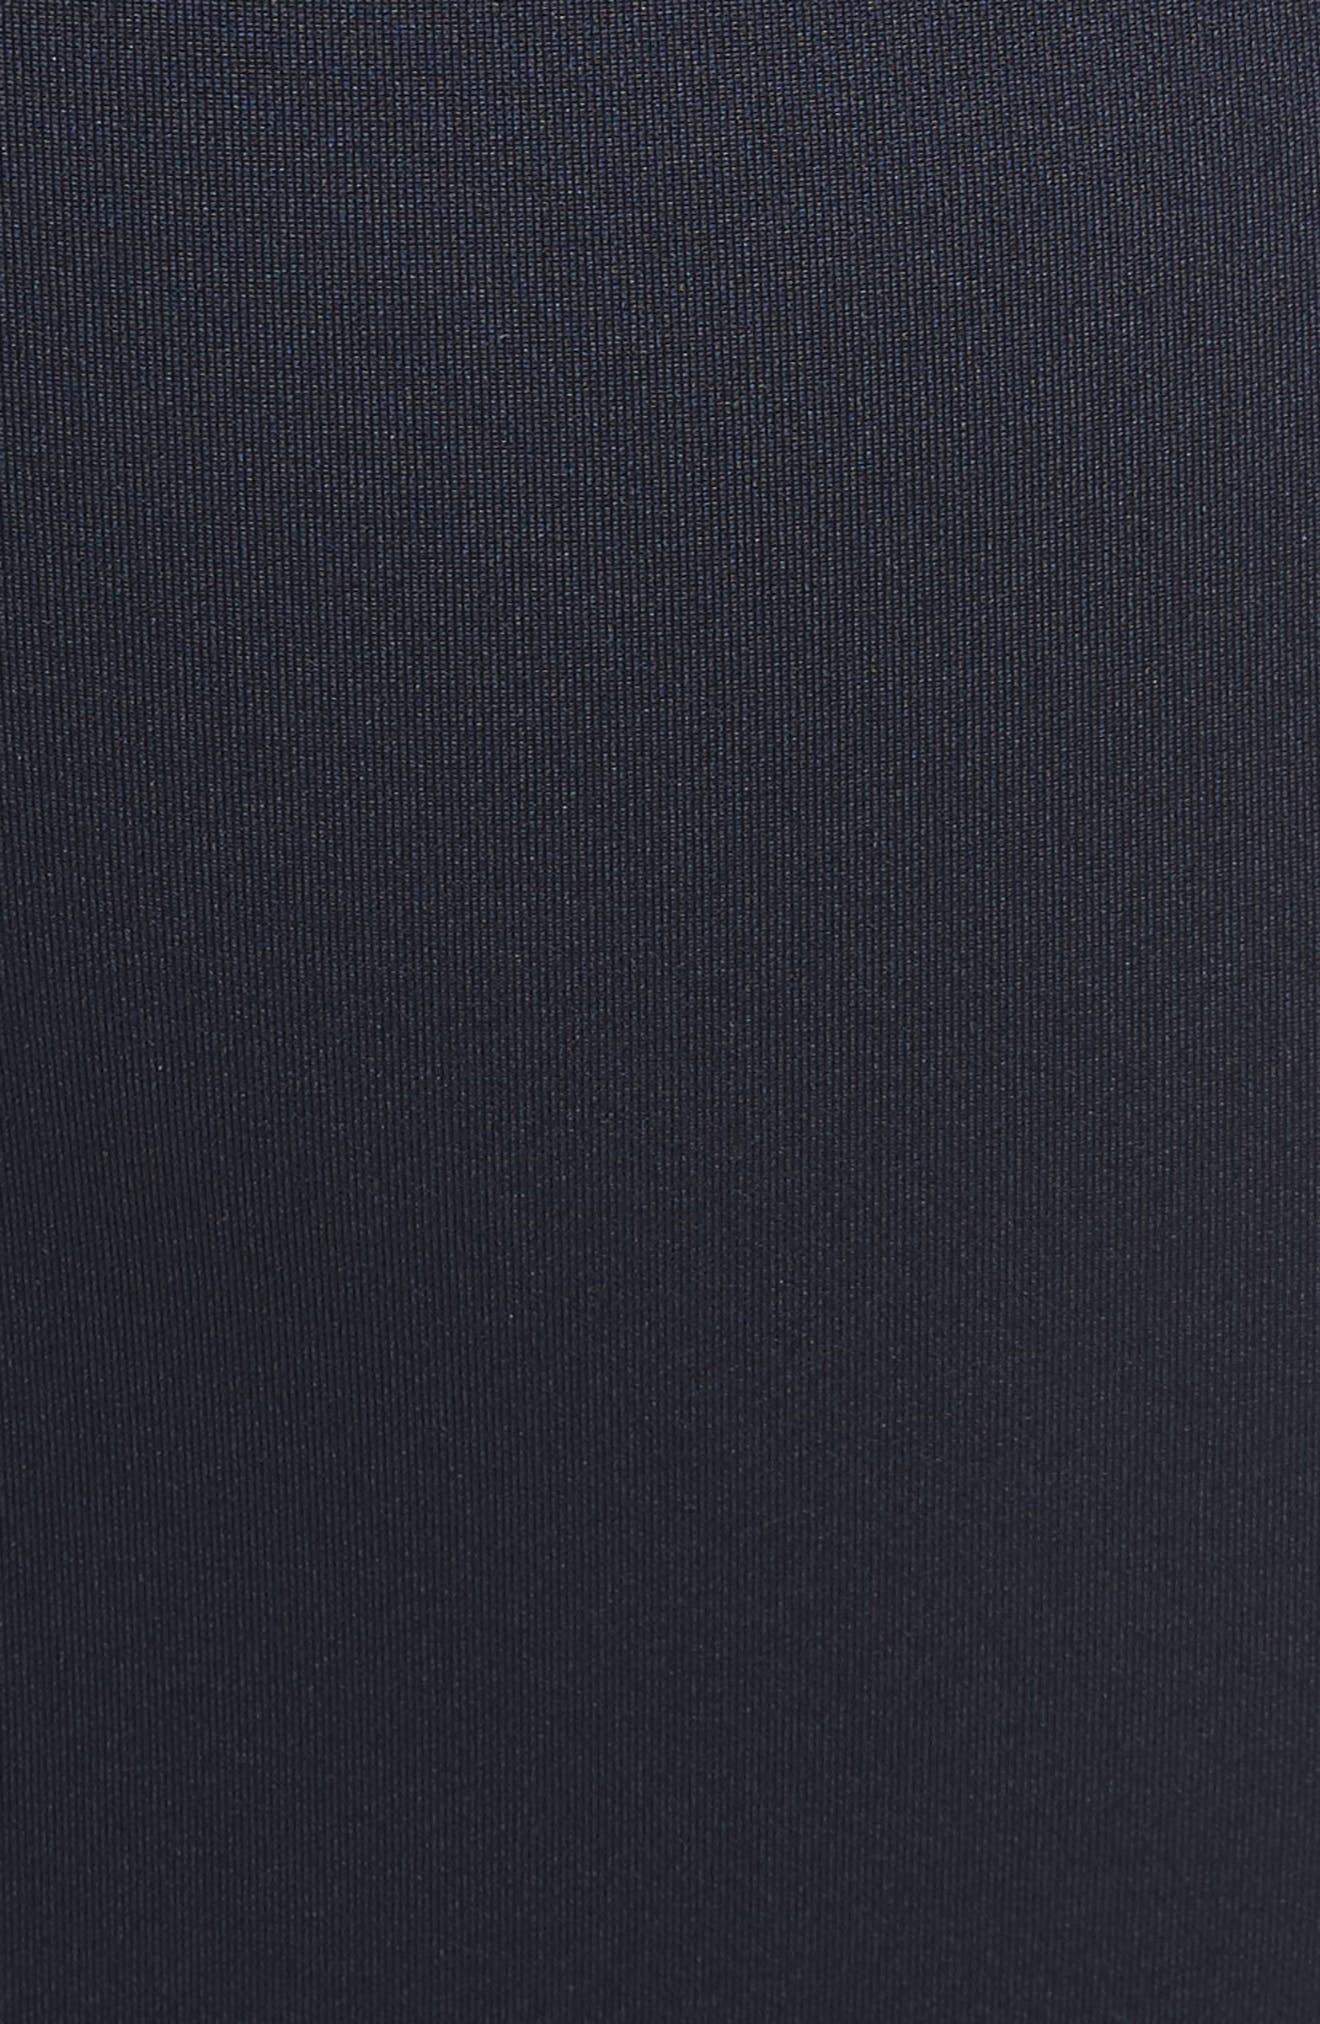 Derosa Oversize Ruffle Pencil Skirt,                             Alternate thumbnail 5, color,                             402